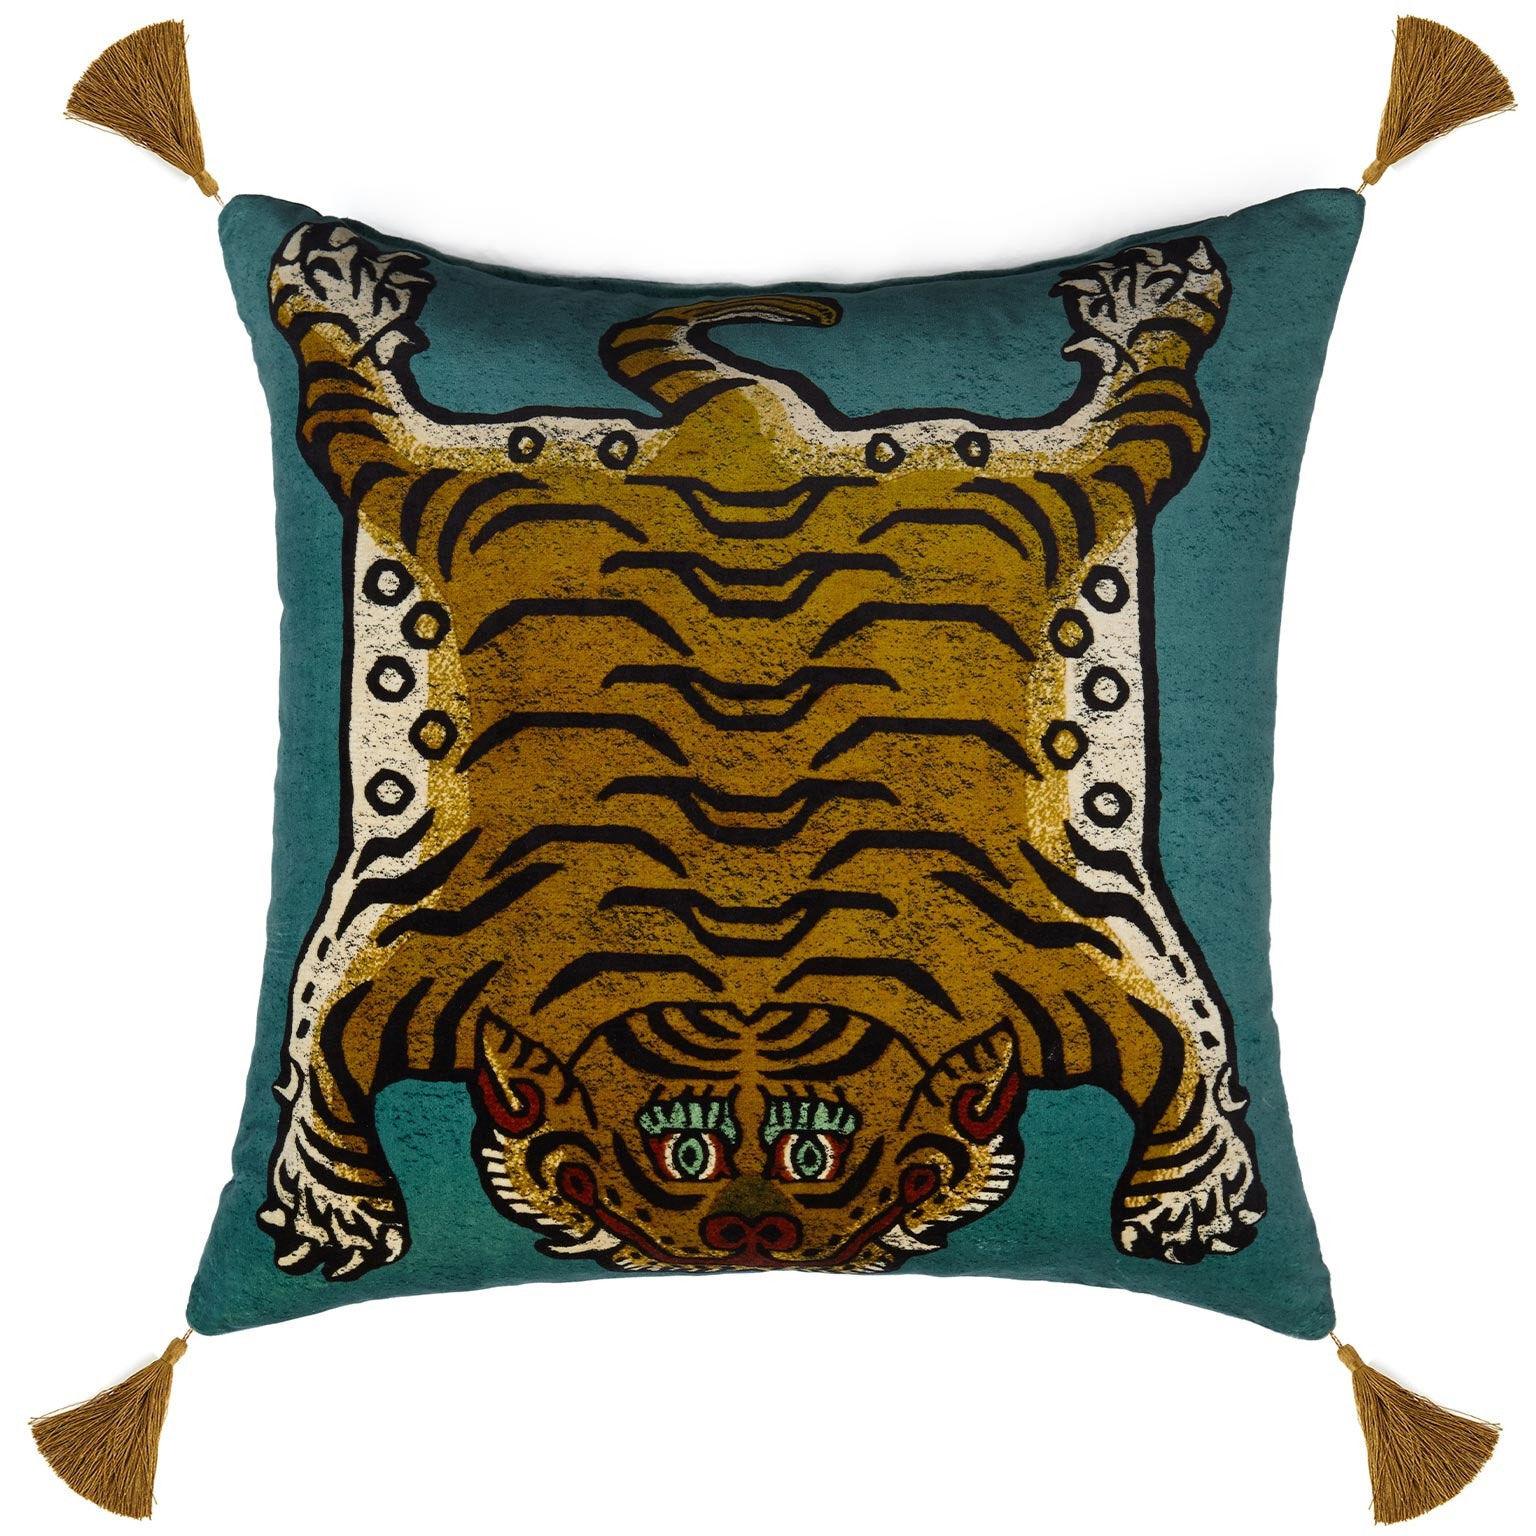 House of Hackney Saber Cushion Large, Teal